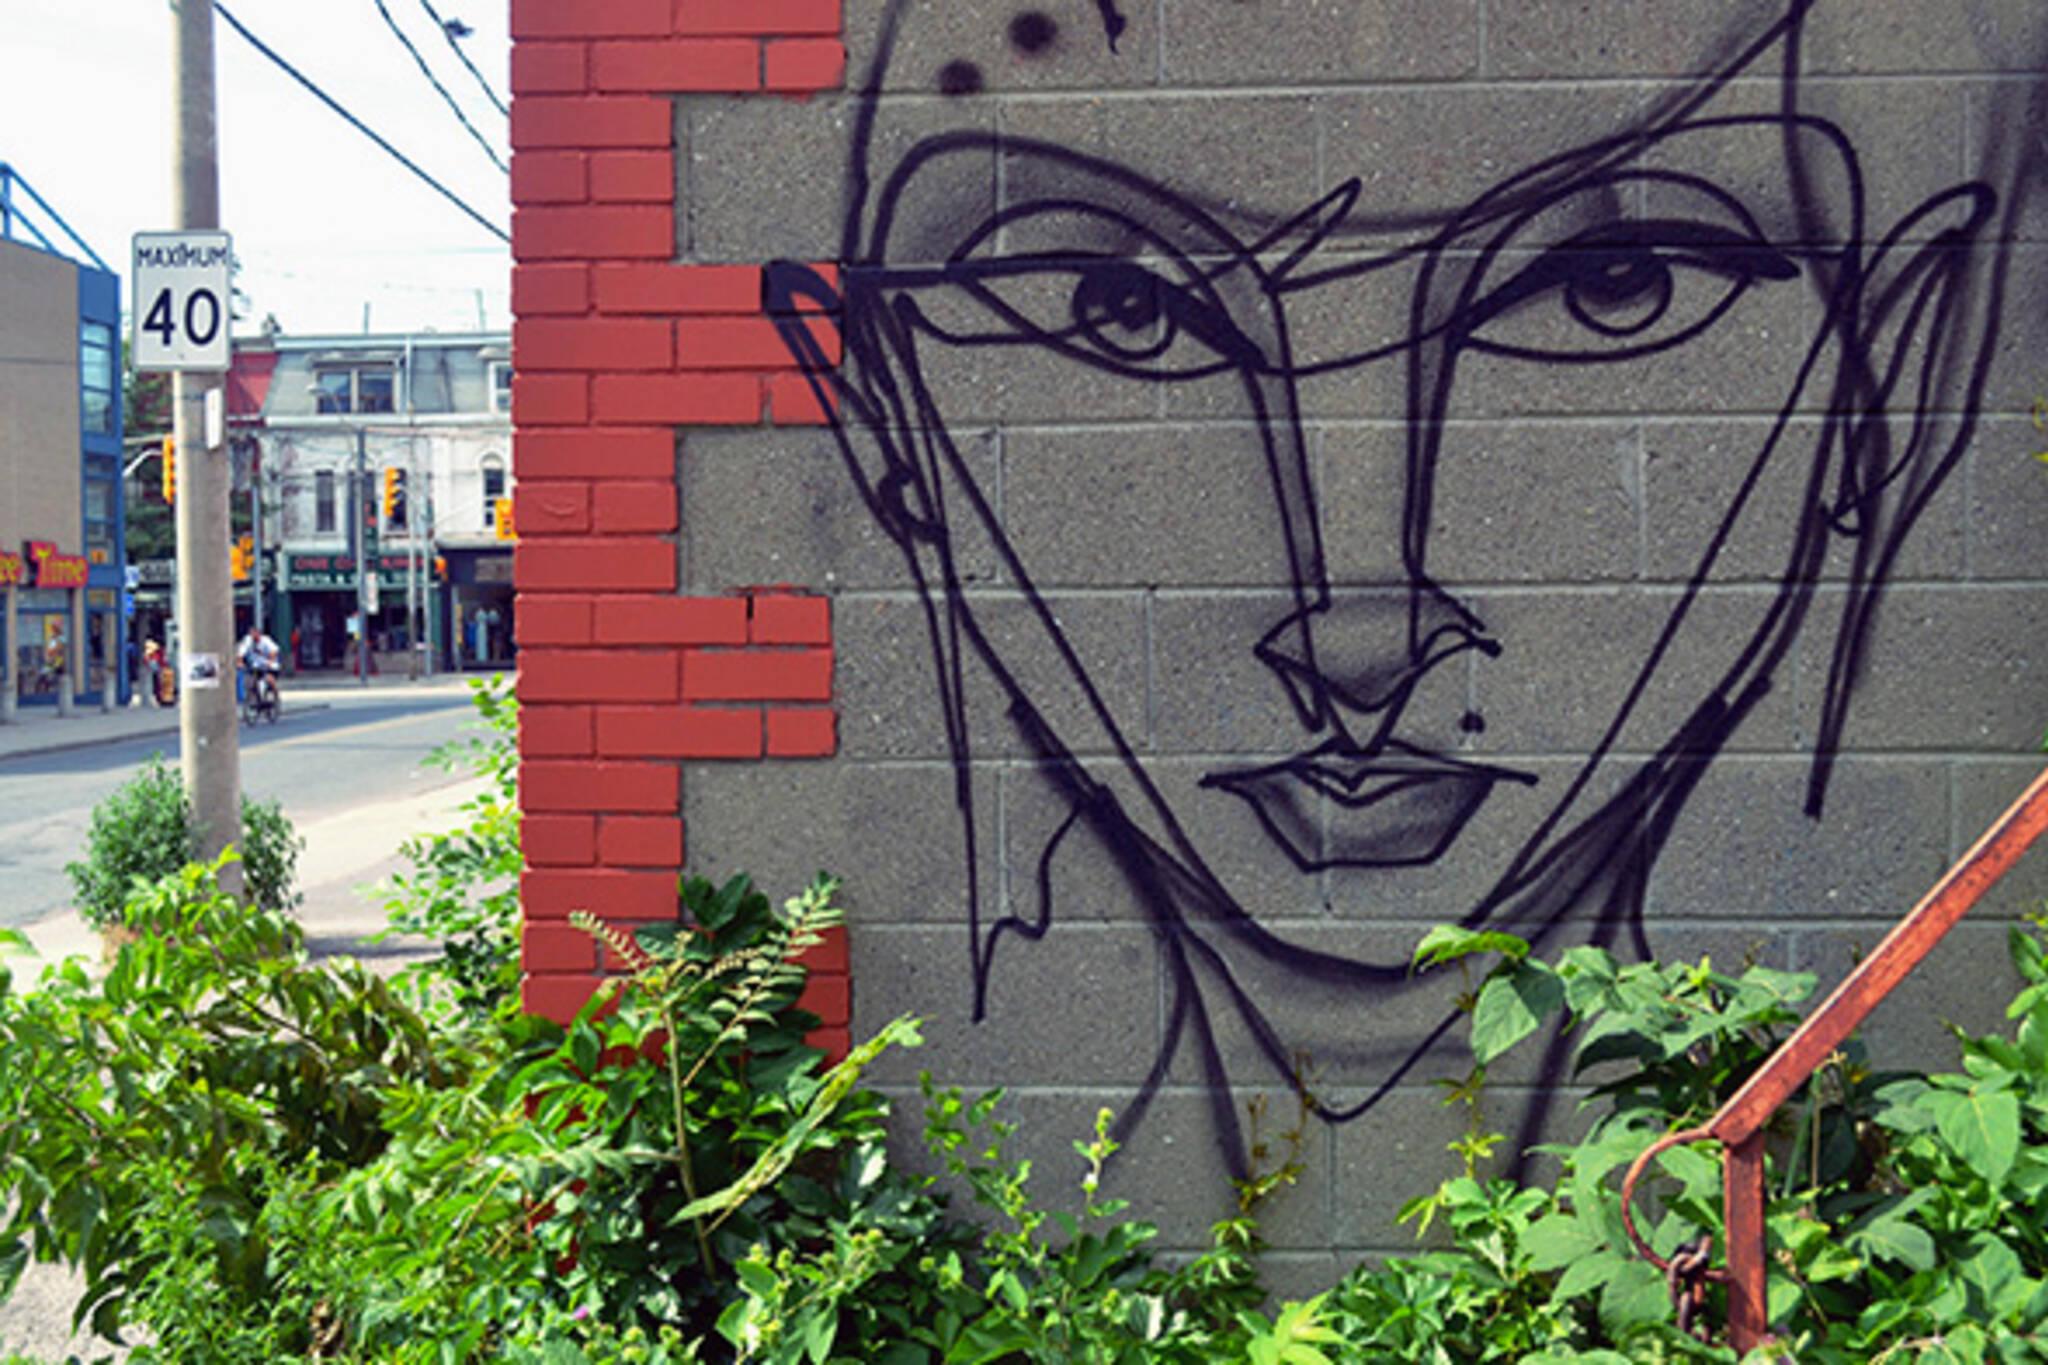 Anser Toronto